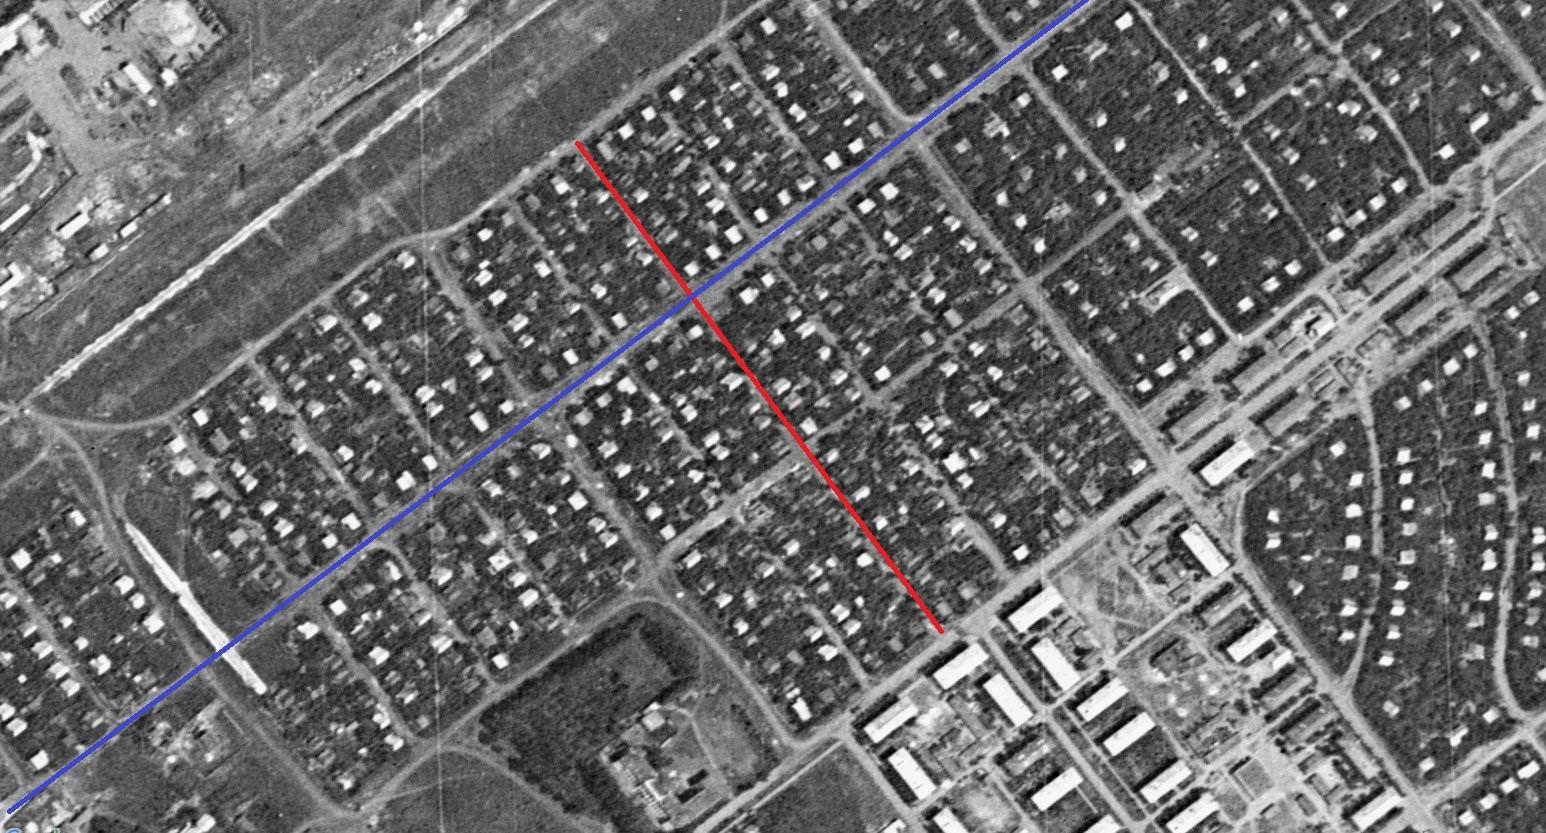 Улица Сторожевая. 1966 год